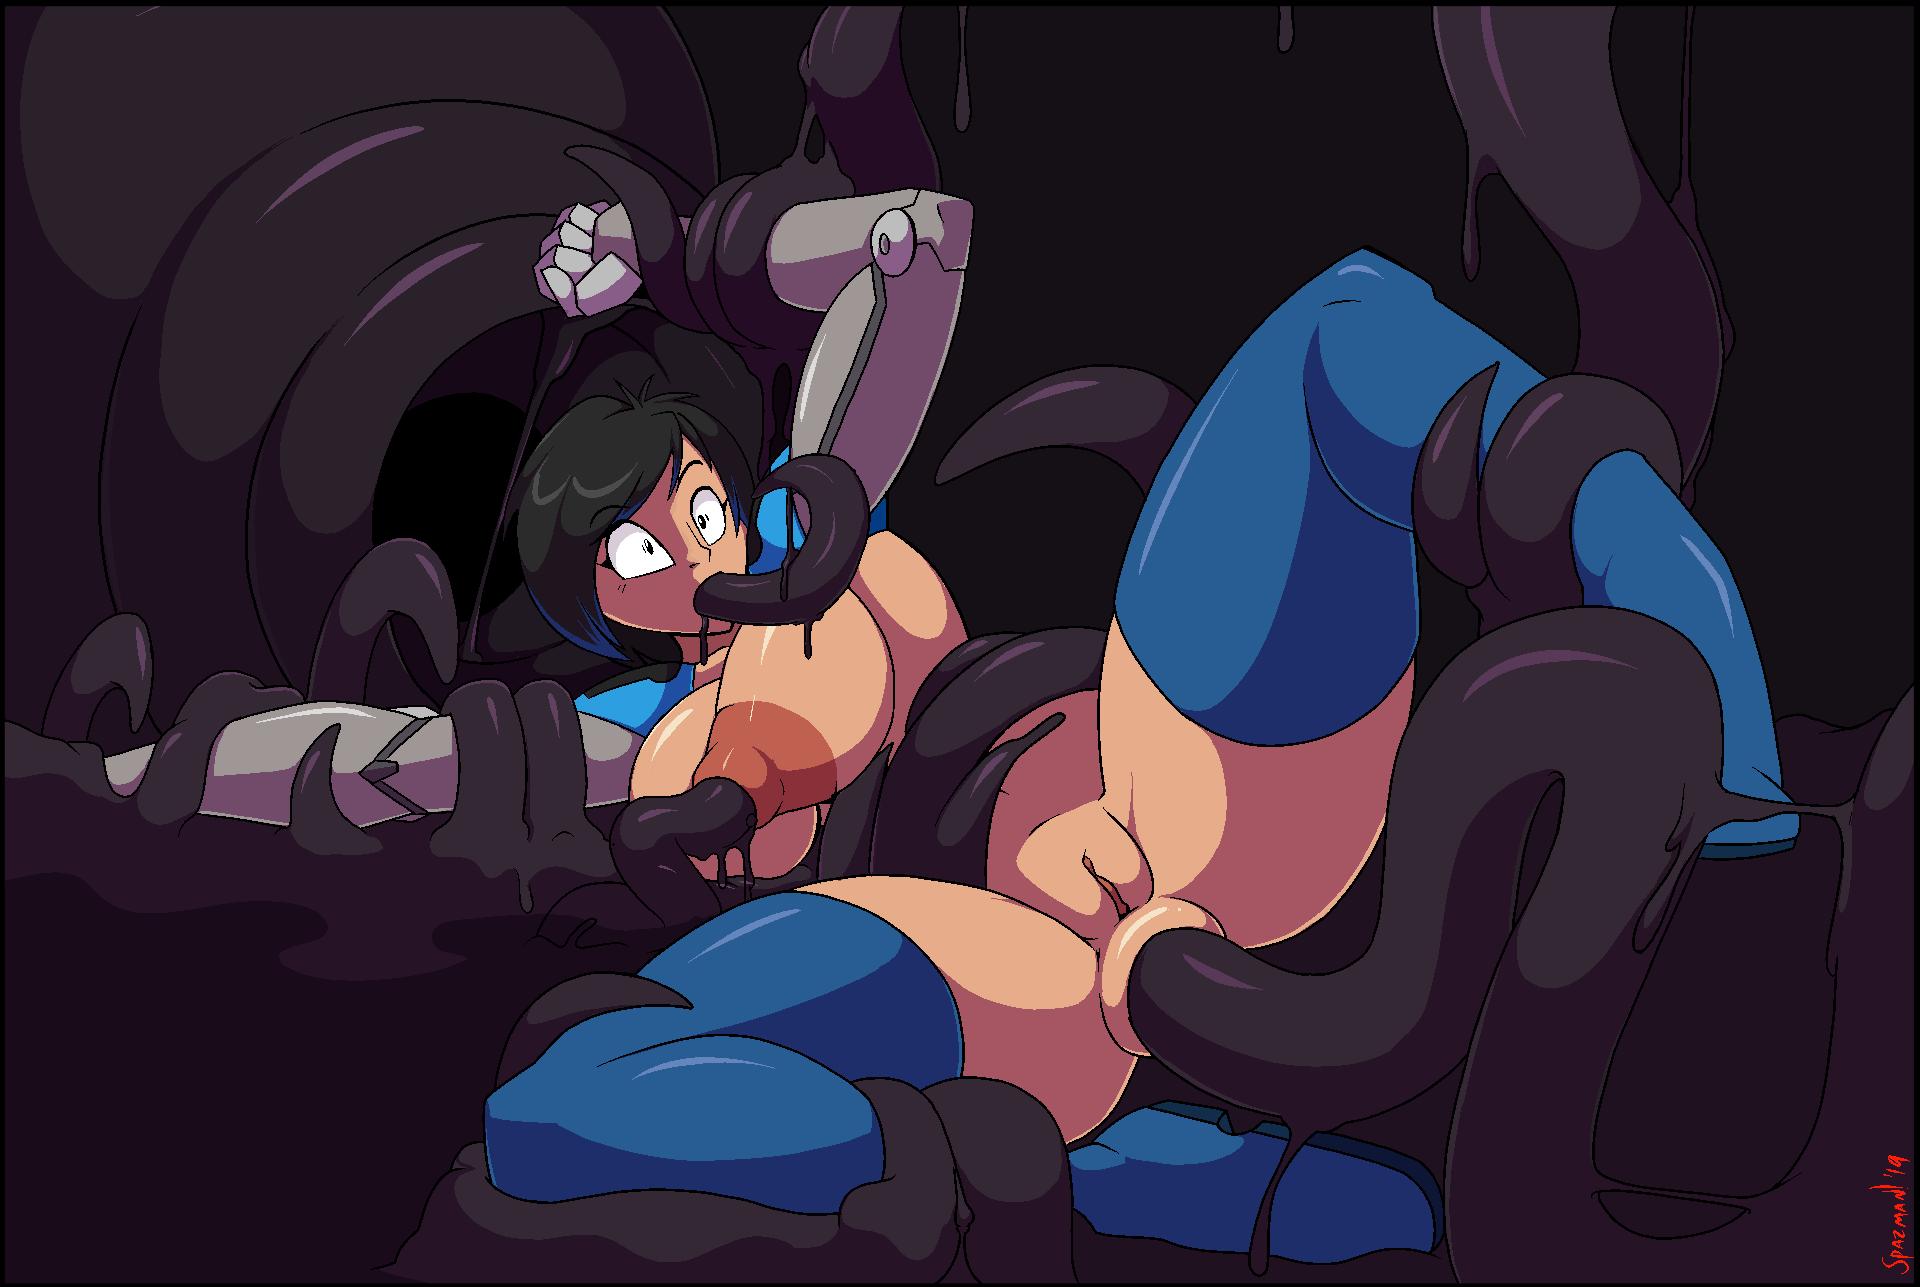 way porn through the all tentacle My hero academia alien girl